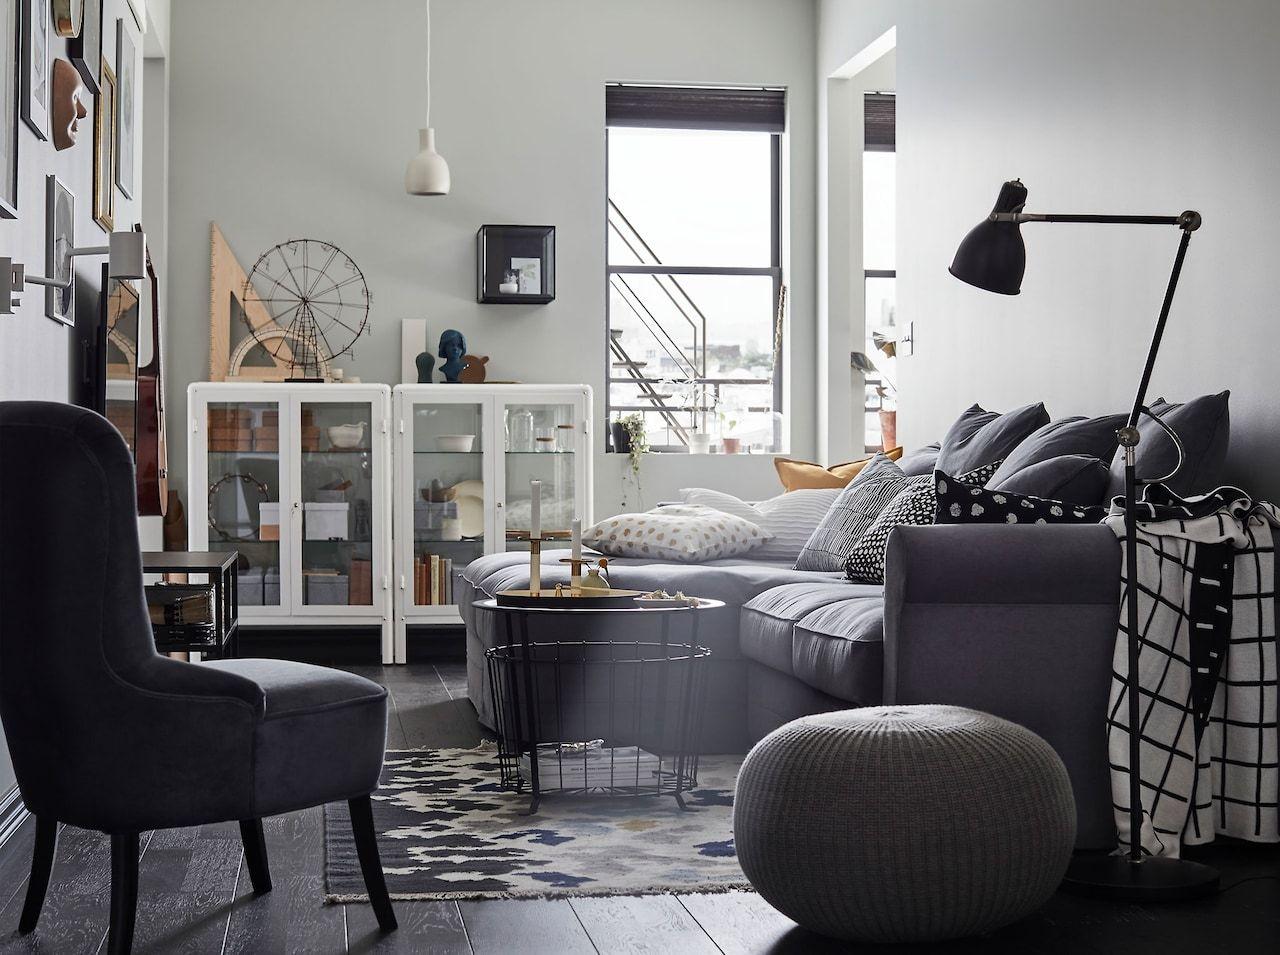 Ikea grÖnlid ljungen dark grey sofa is meant to last a family a